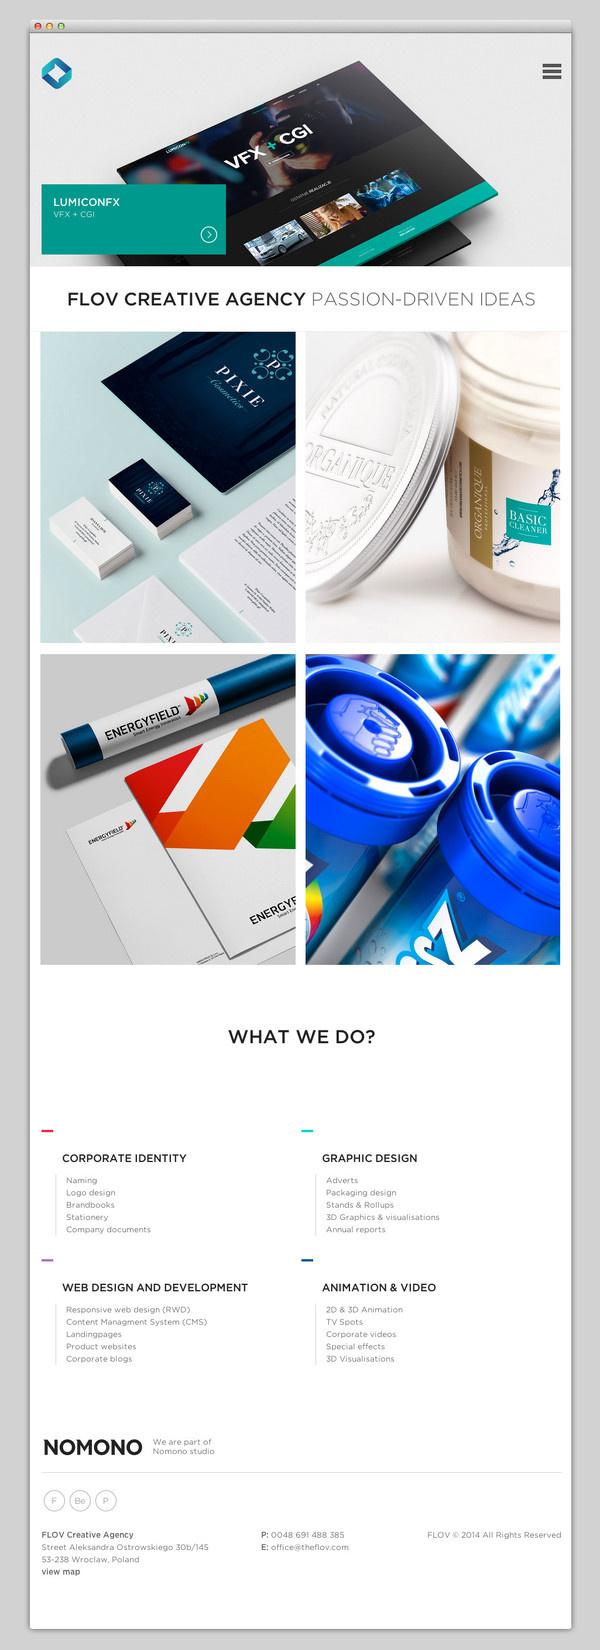 FLOV Creative Agency #website #layout #design #web